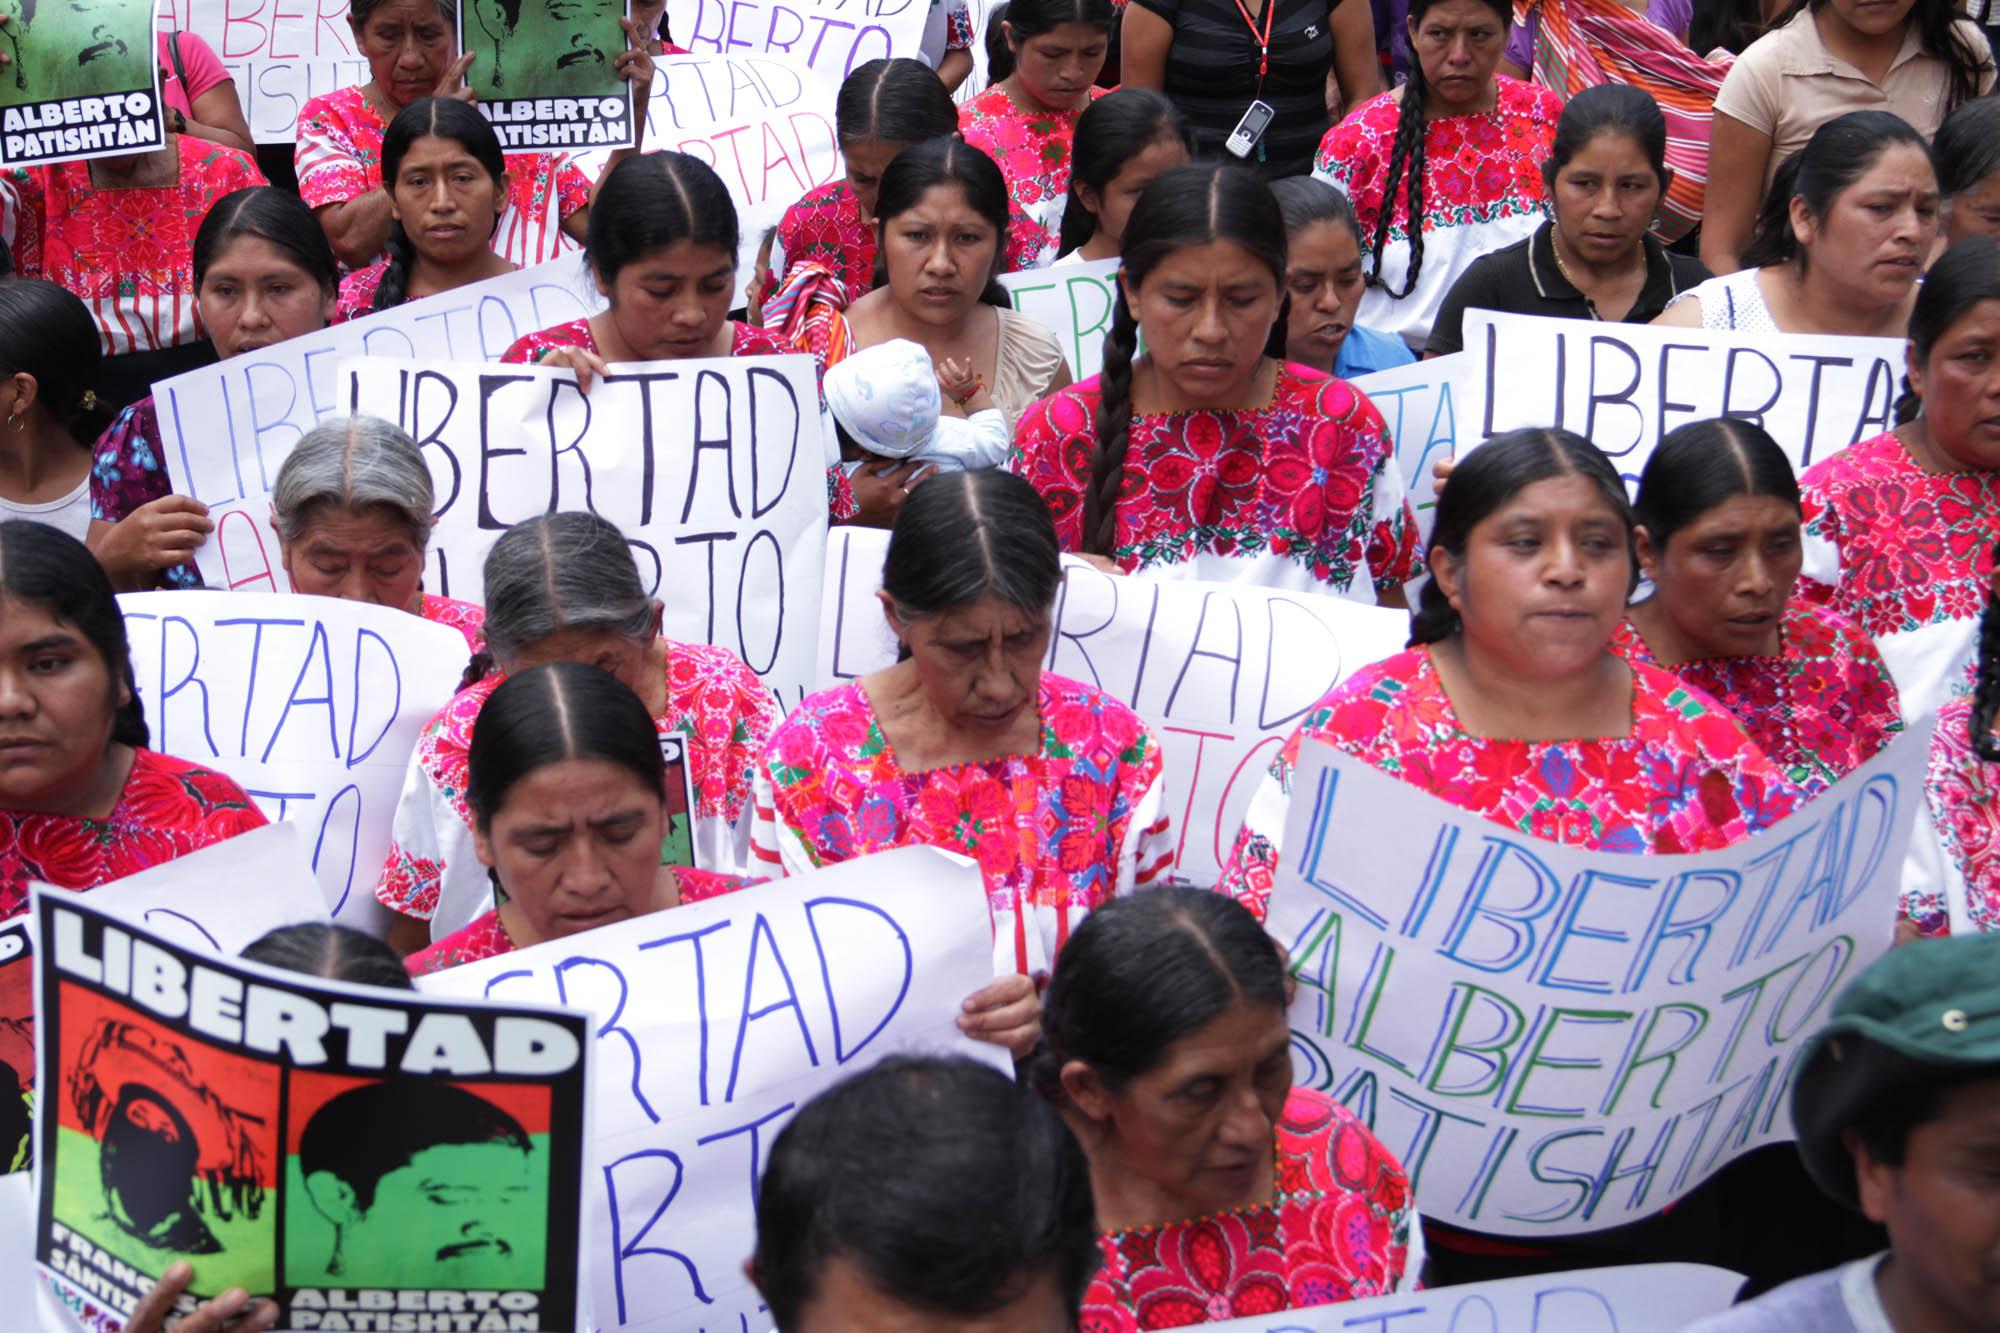 Мексико: политически затворник ослепява заради лекарска немарливост